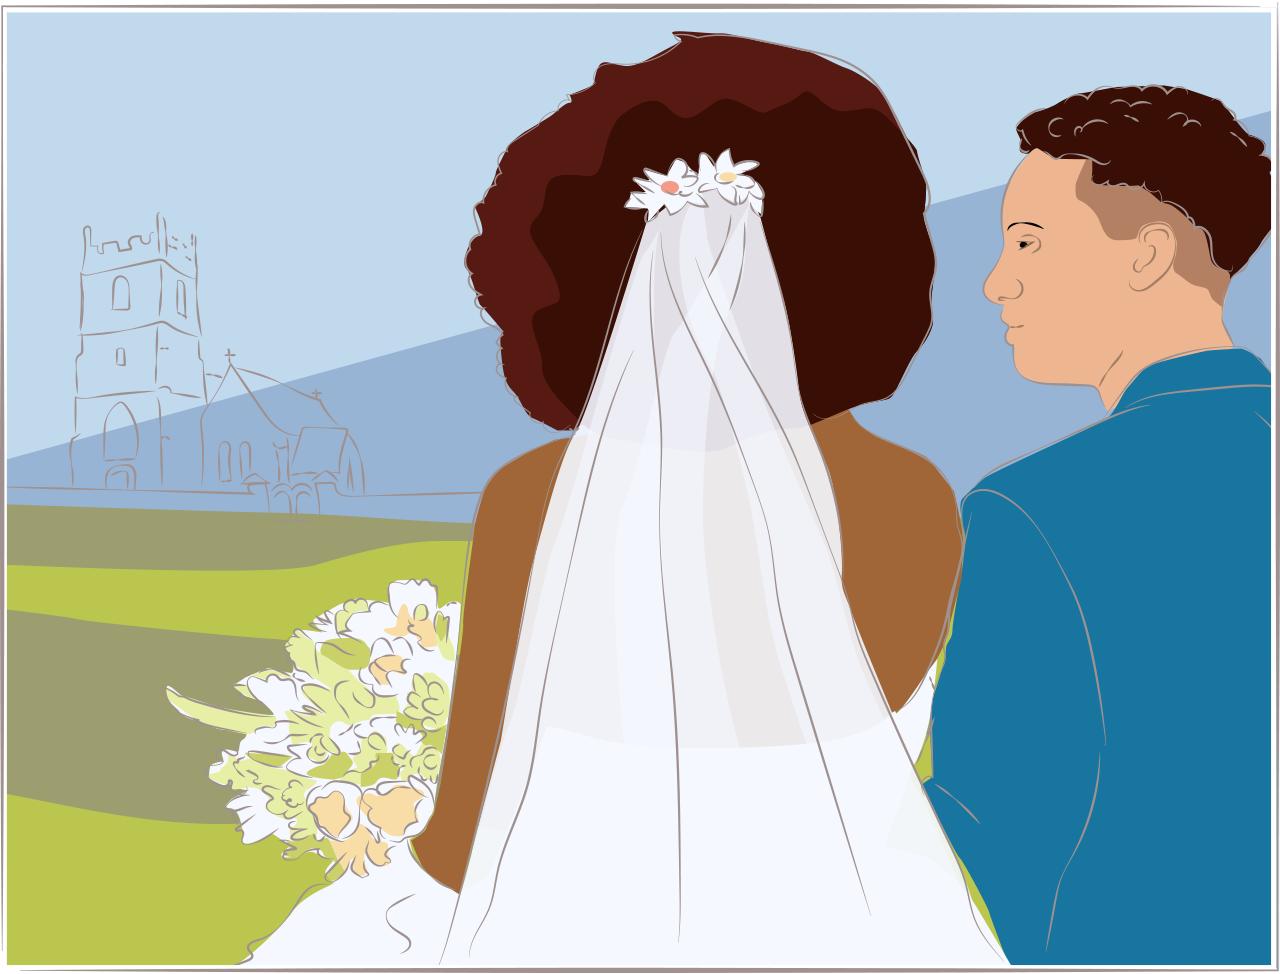 Illustration of an outdoor wedding